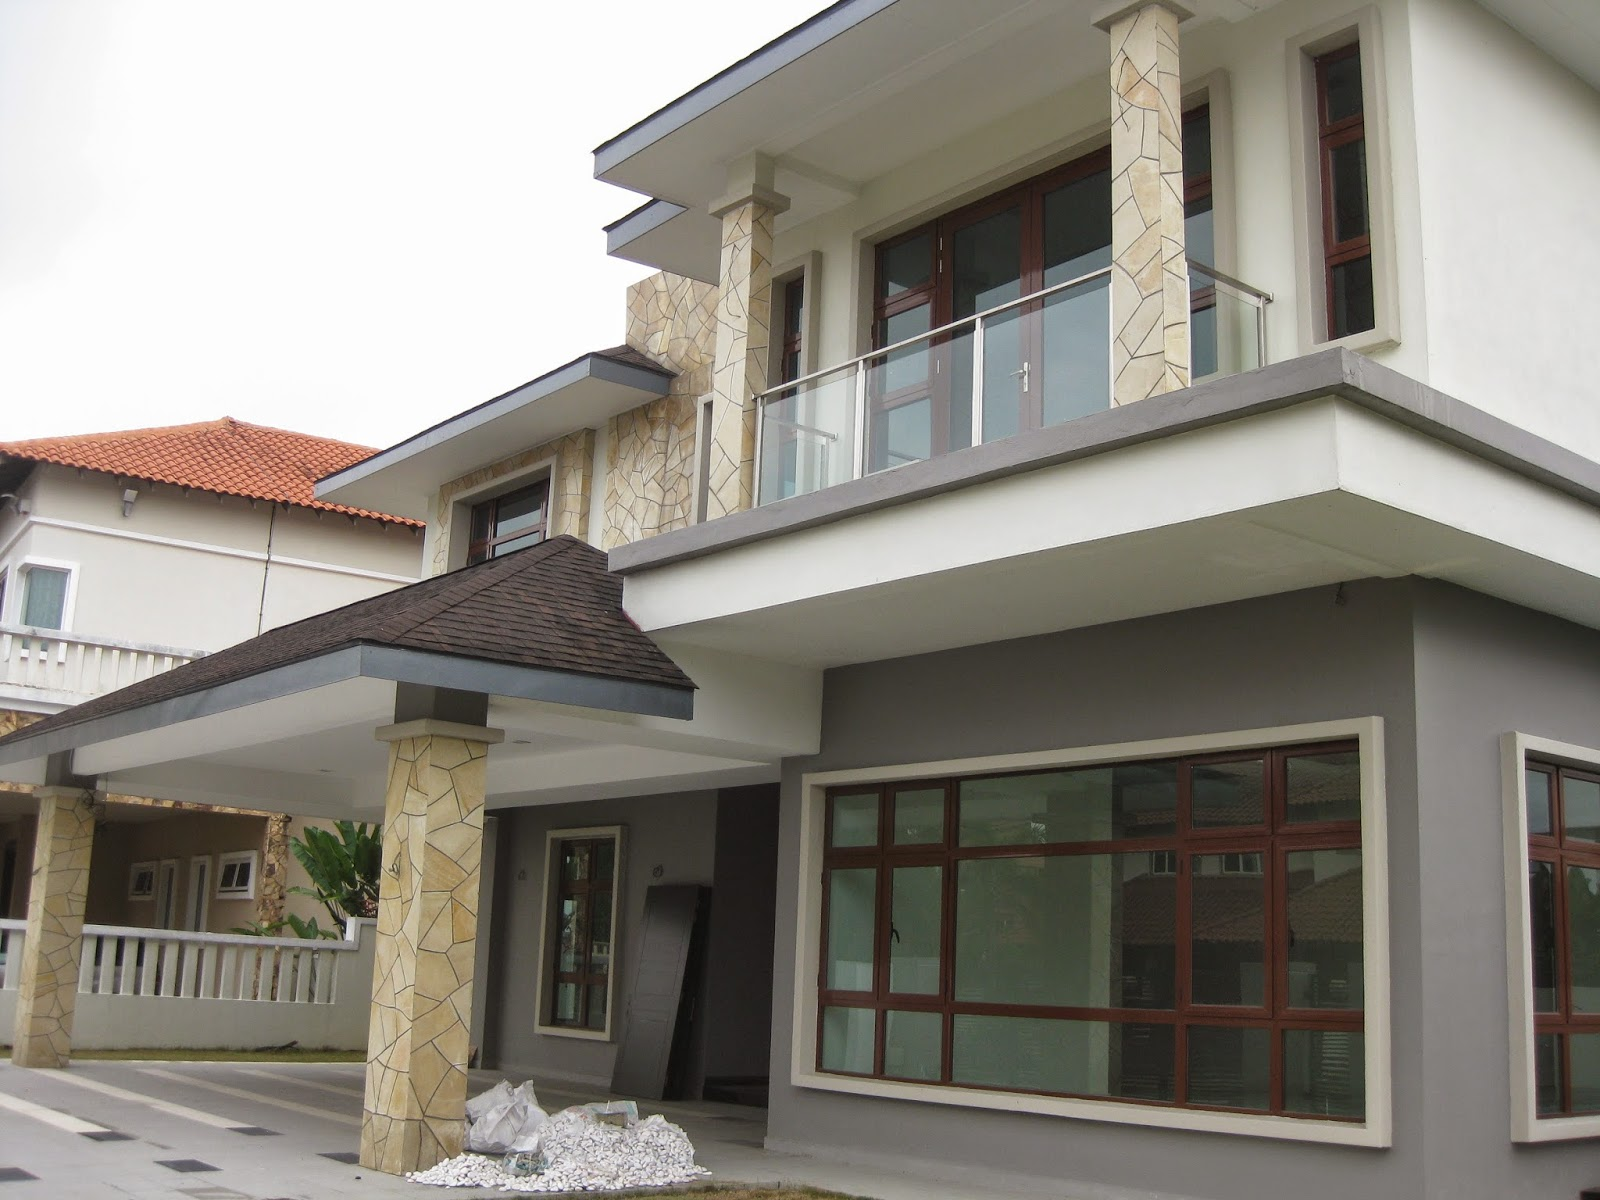 Kota Damansara Polo Club Two Storey Brand New Bungalow